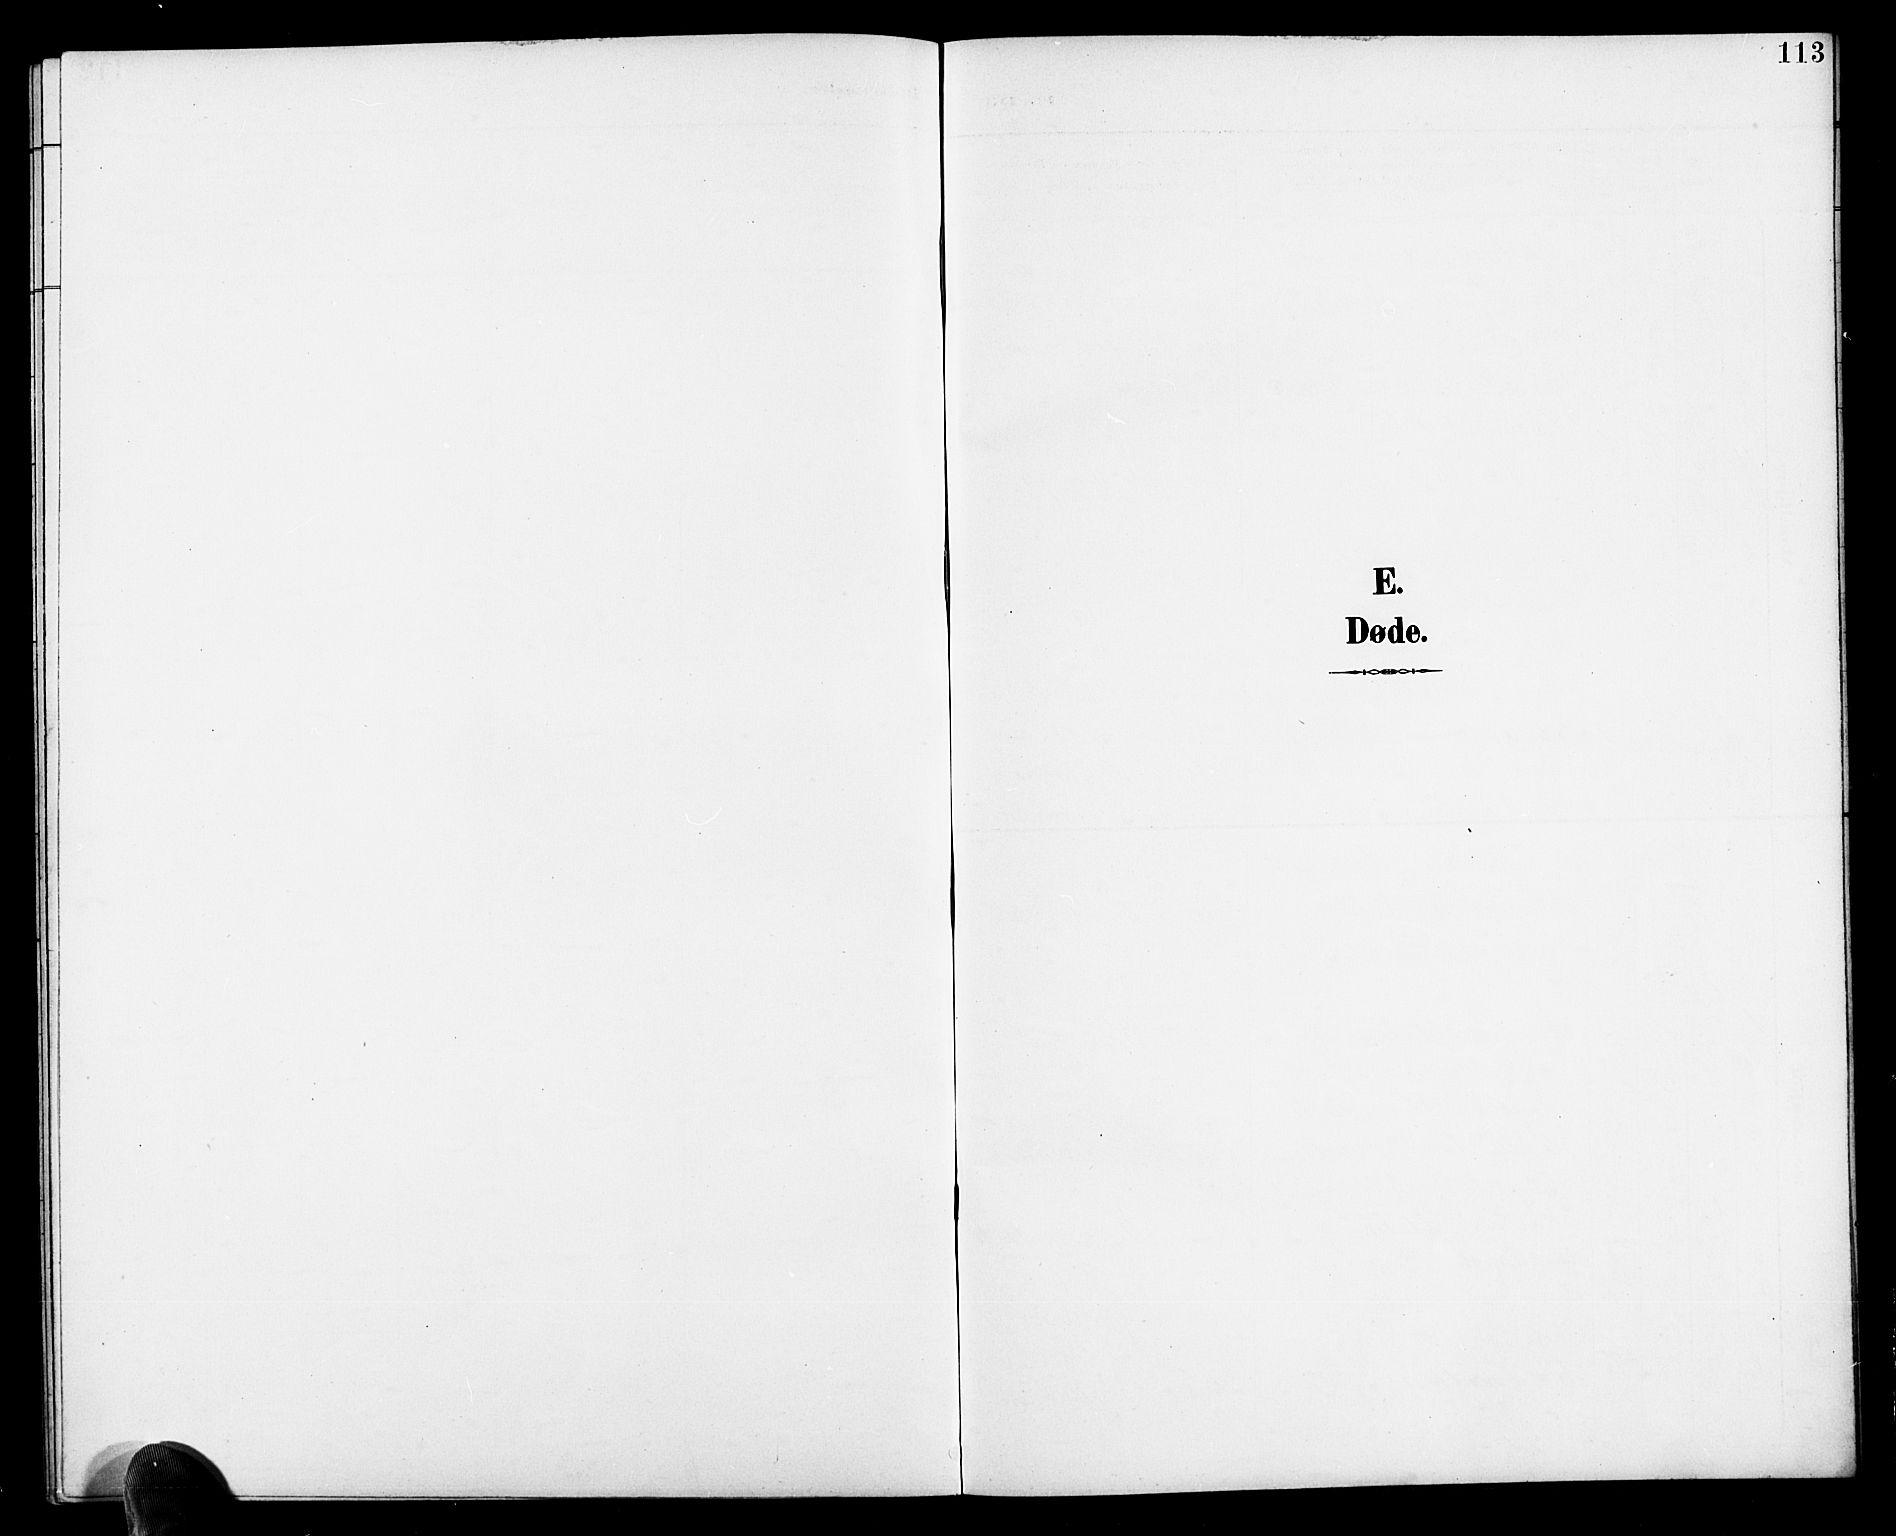 SAK, Herefoss sokneprestkontor, F/Fb/Fbb/L0003: Klokkerbok nr. B 3, 1892-1917, s. 113